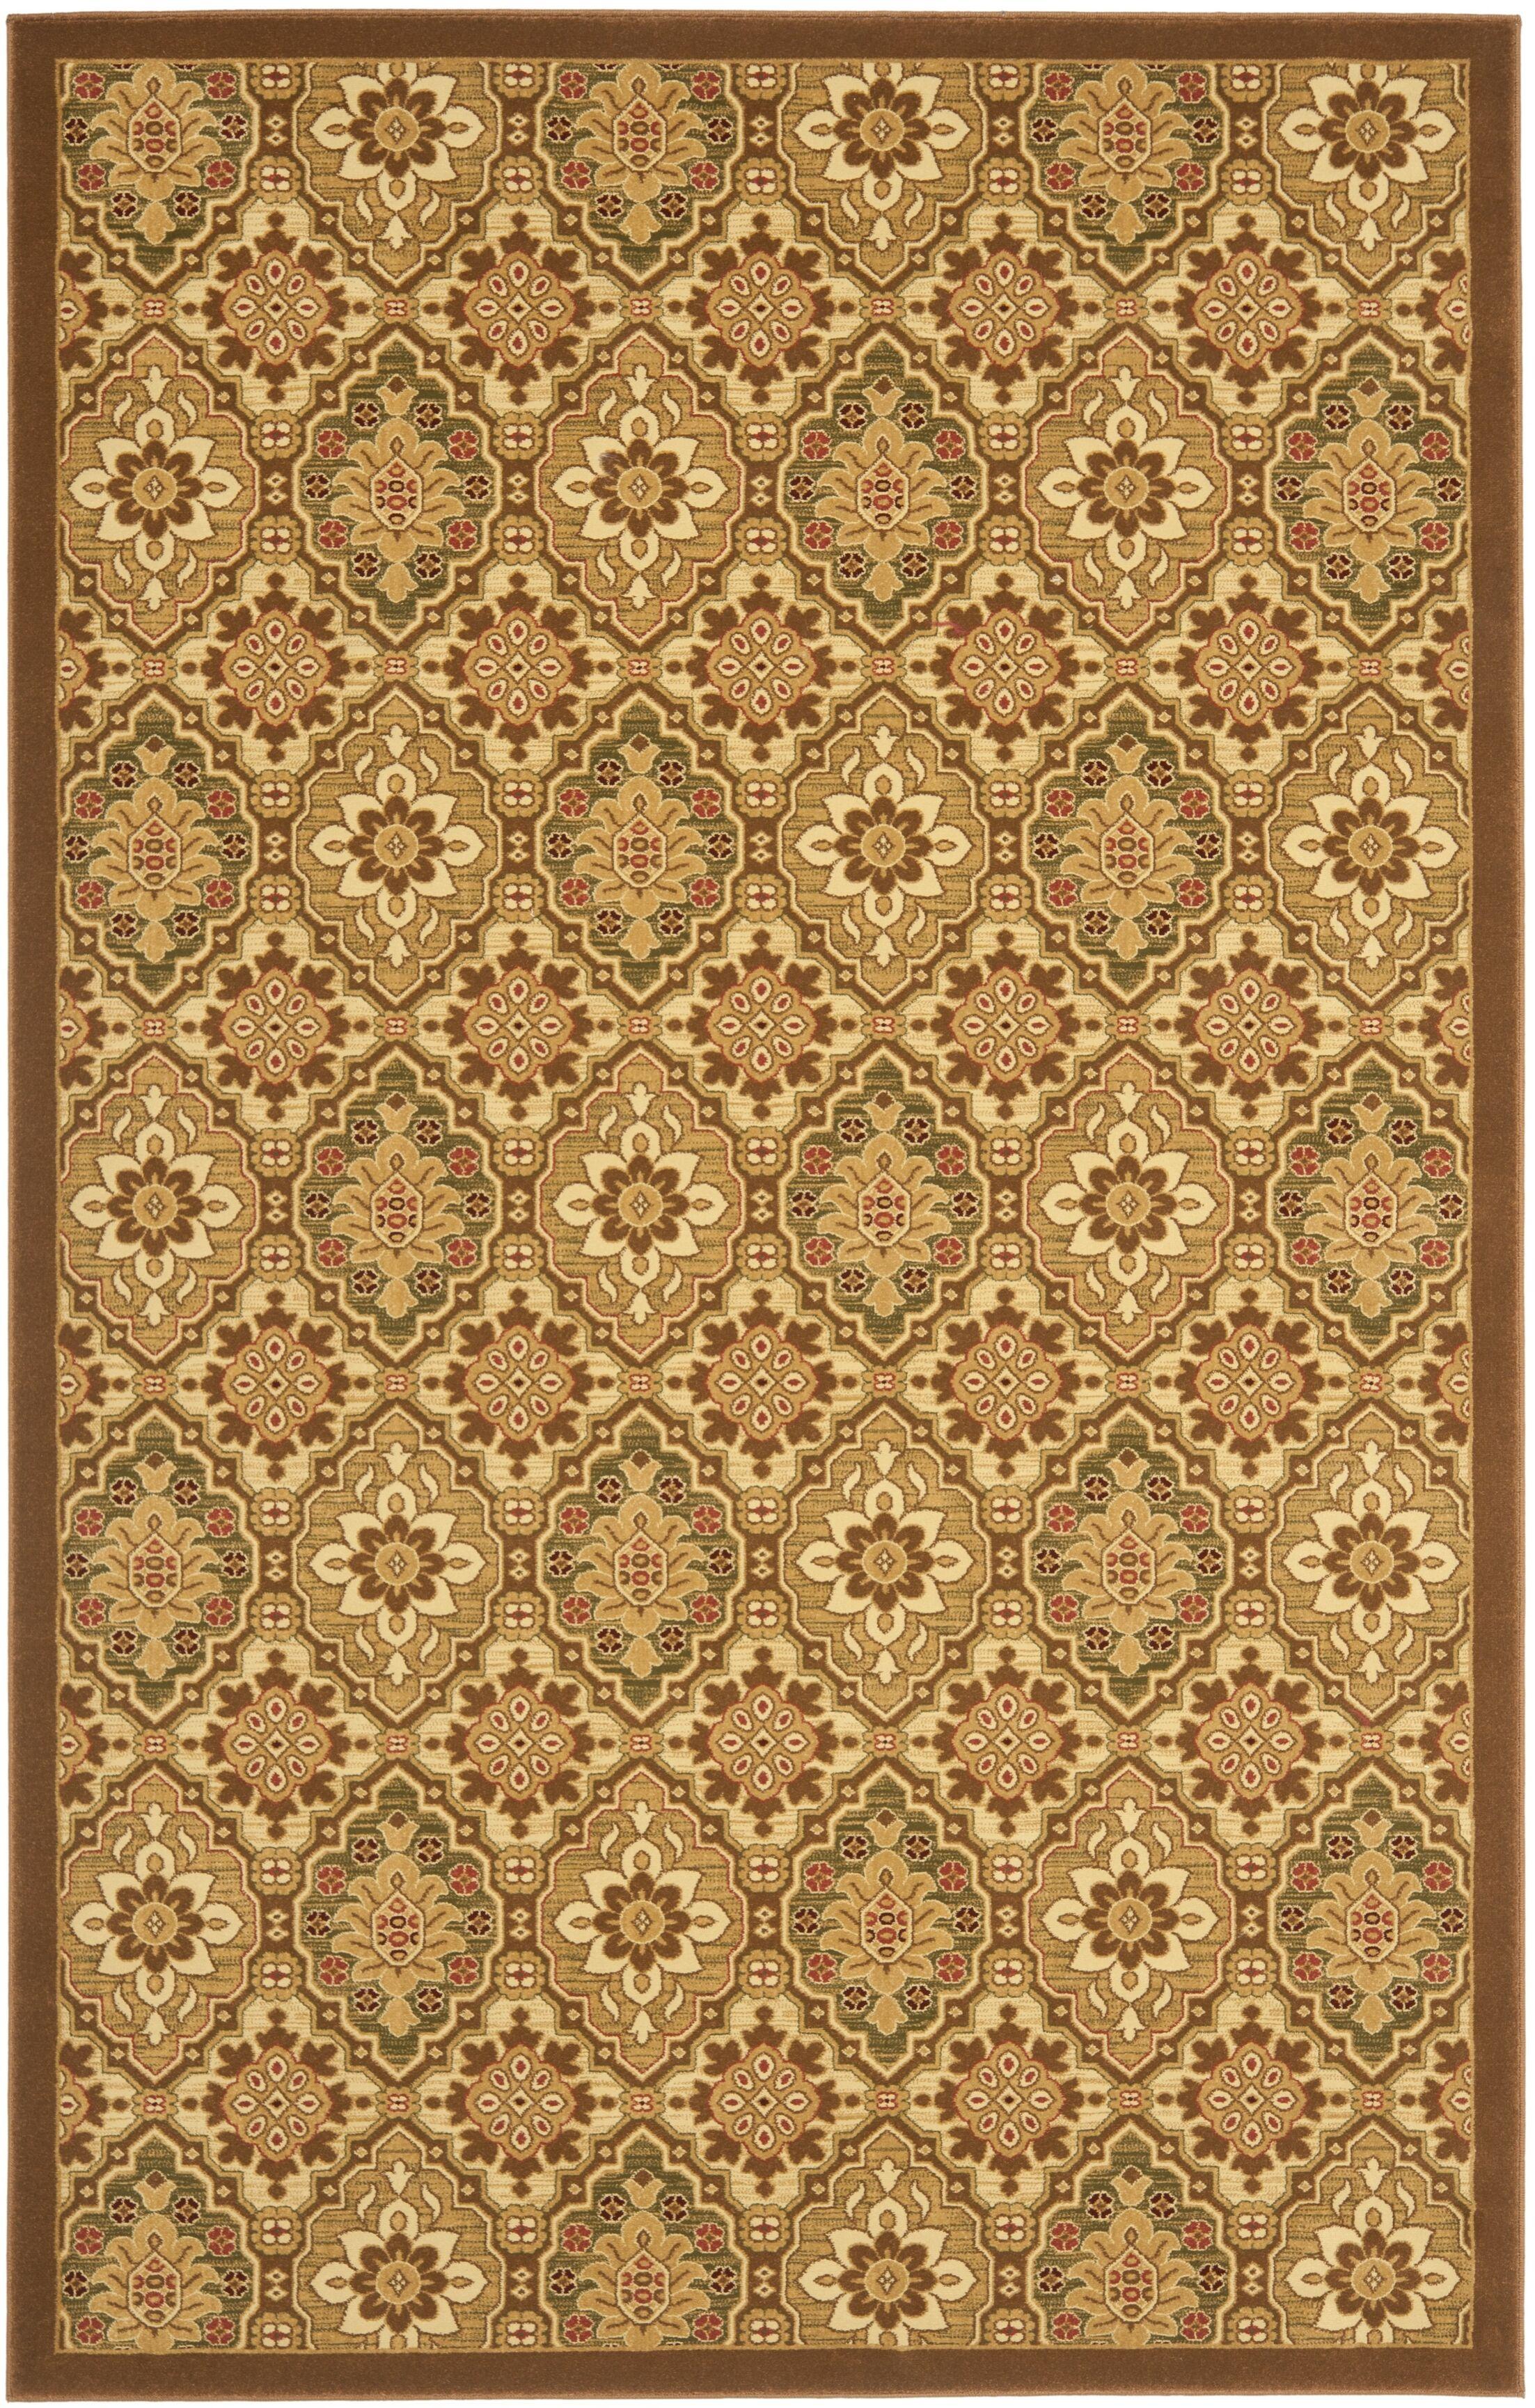 Treasures Brown Area Rug Rug Size: Rectangle 5'1